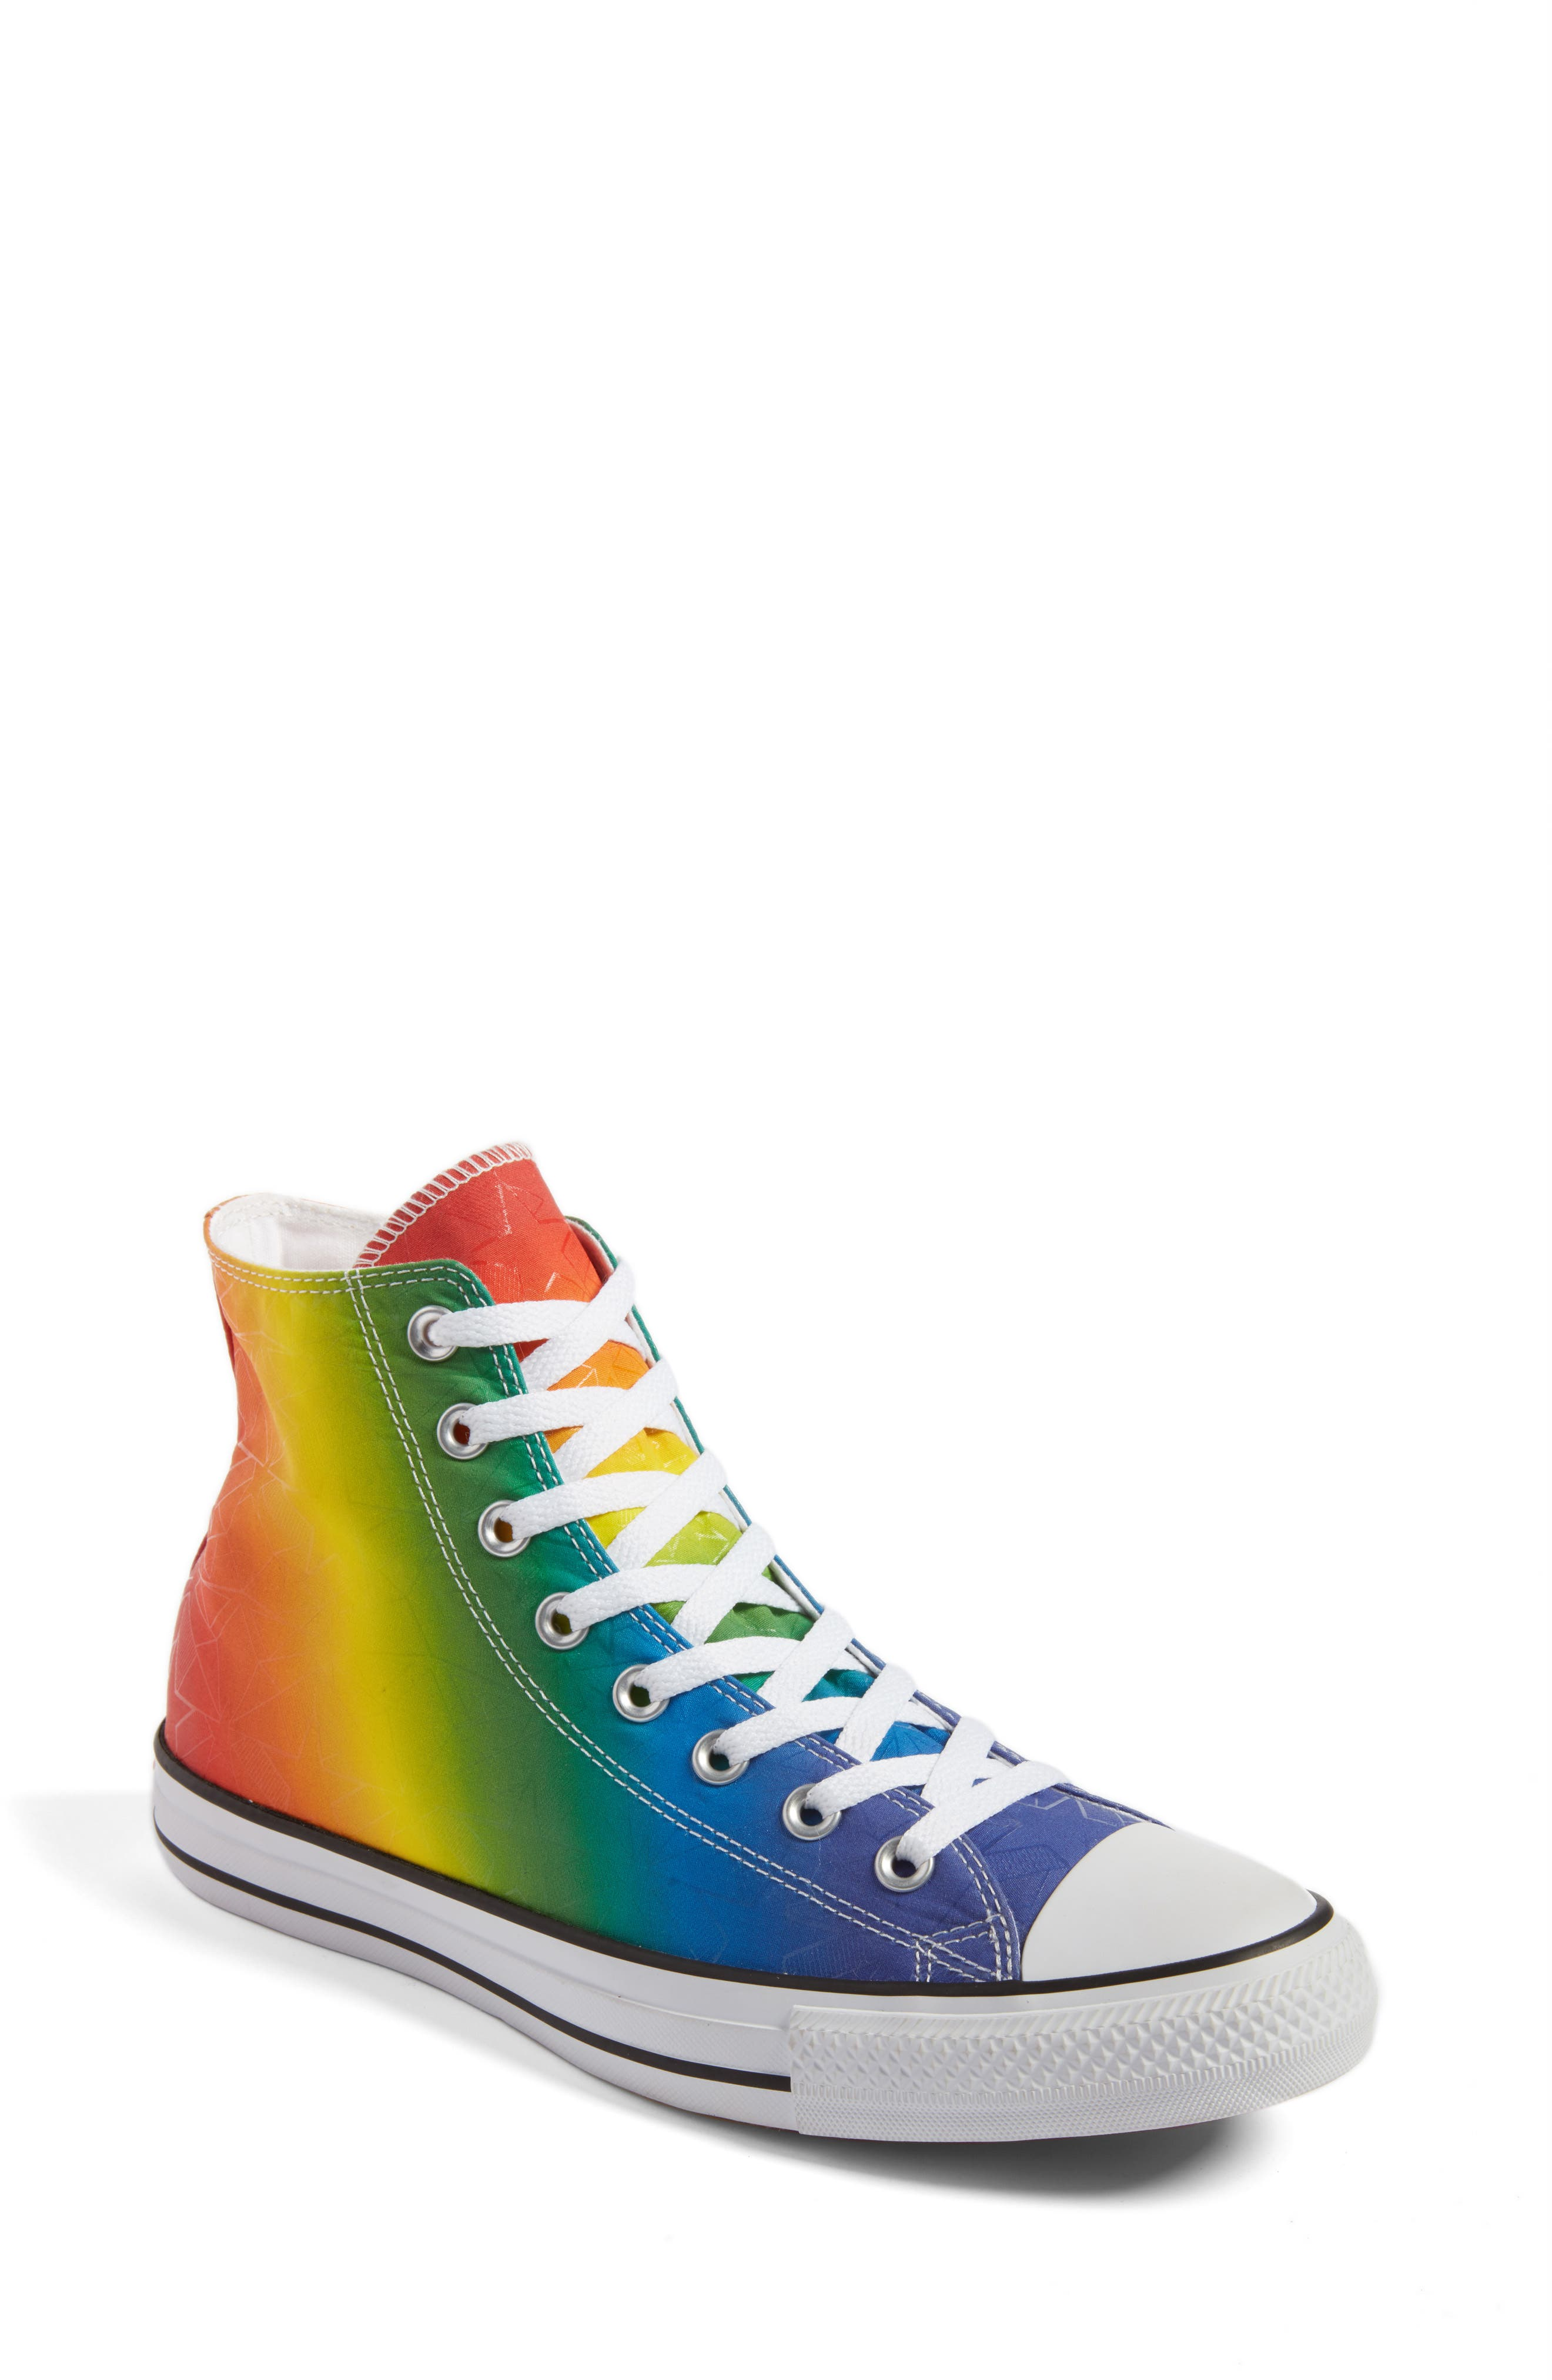 Chuck Taylor<sup>®</sup> All Star<sup>®</sup> Pride High Top Sneaker,                             Main thumbnail 1, color,                             500